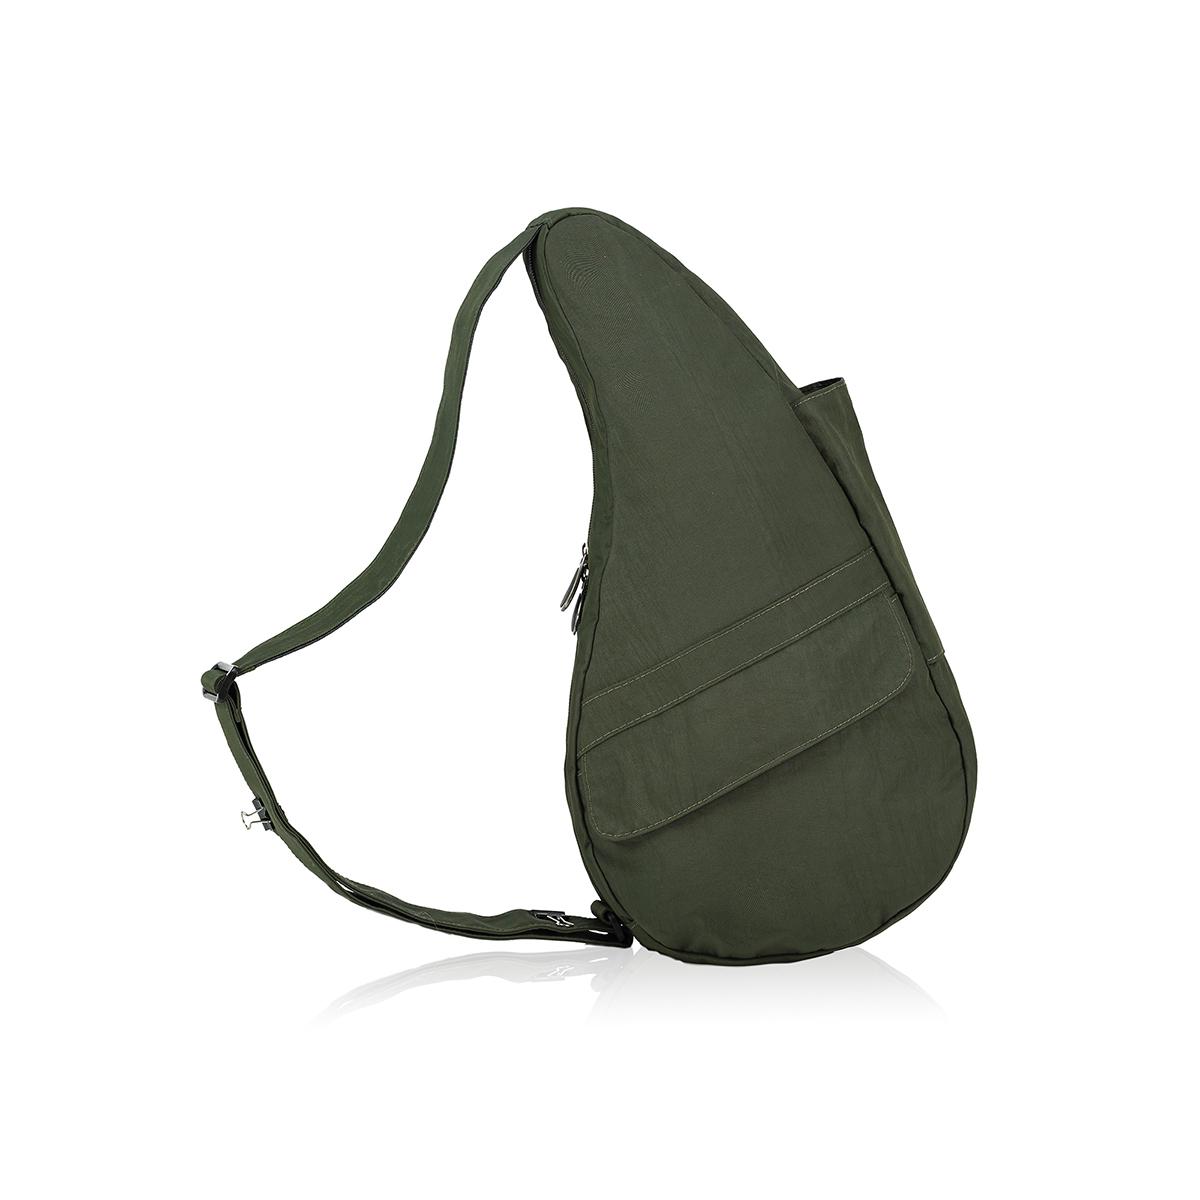 Healthy Back Bag/ヘルシーバックバッグ/ショルダーバッグ/ボディバッグ/旅行バッグ/軽量/レディース/メンズ 《限定ポーチ付》 公式ストア ヘルシーバックバッグ テクスチャードナイロン Sサイズ ディープフォレスト